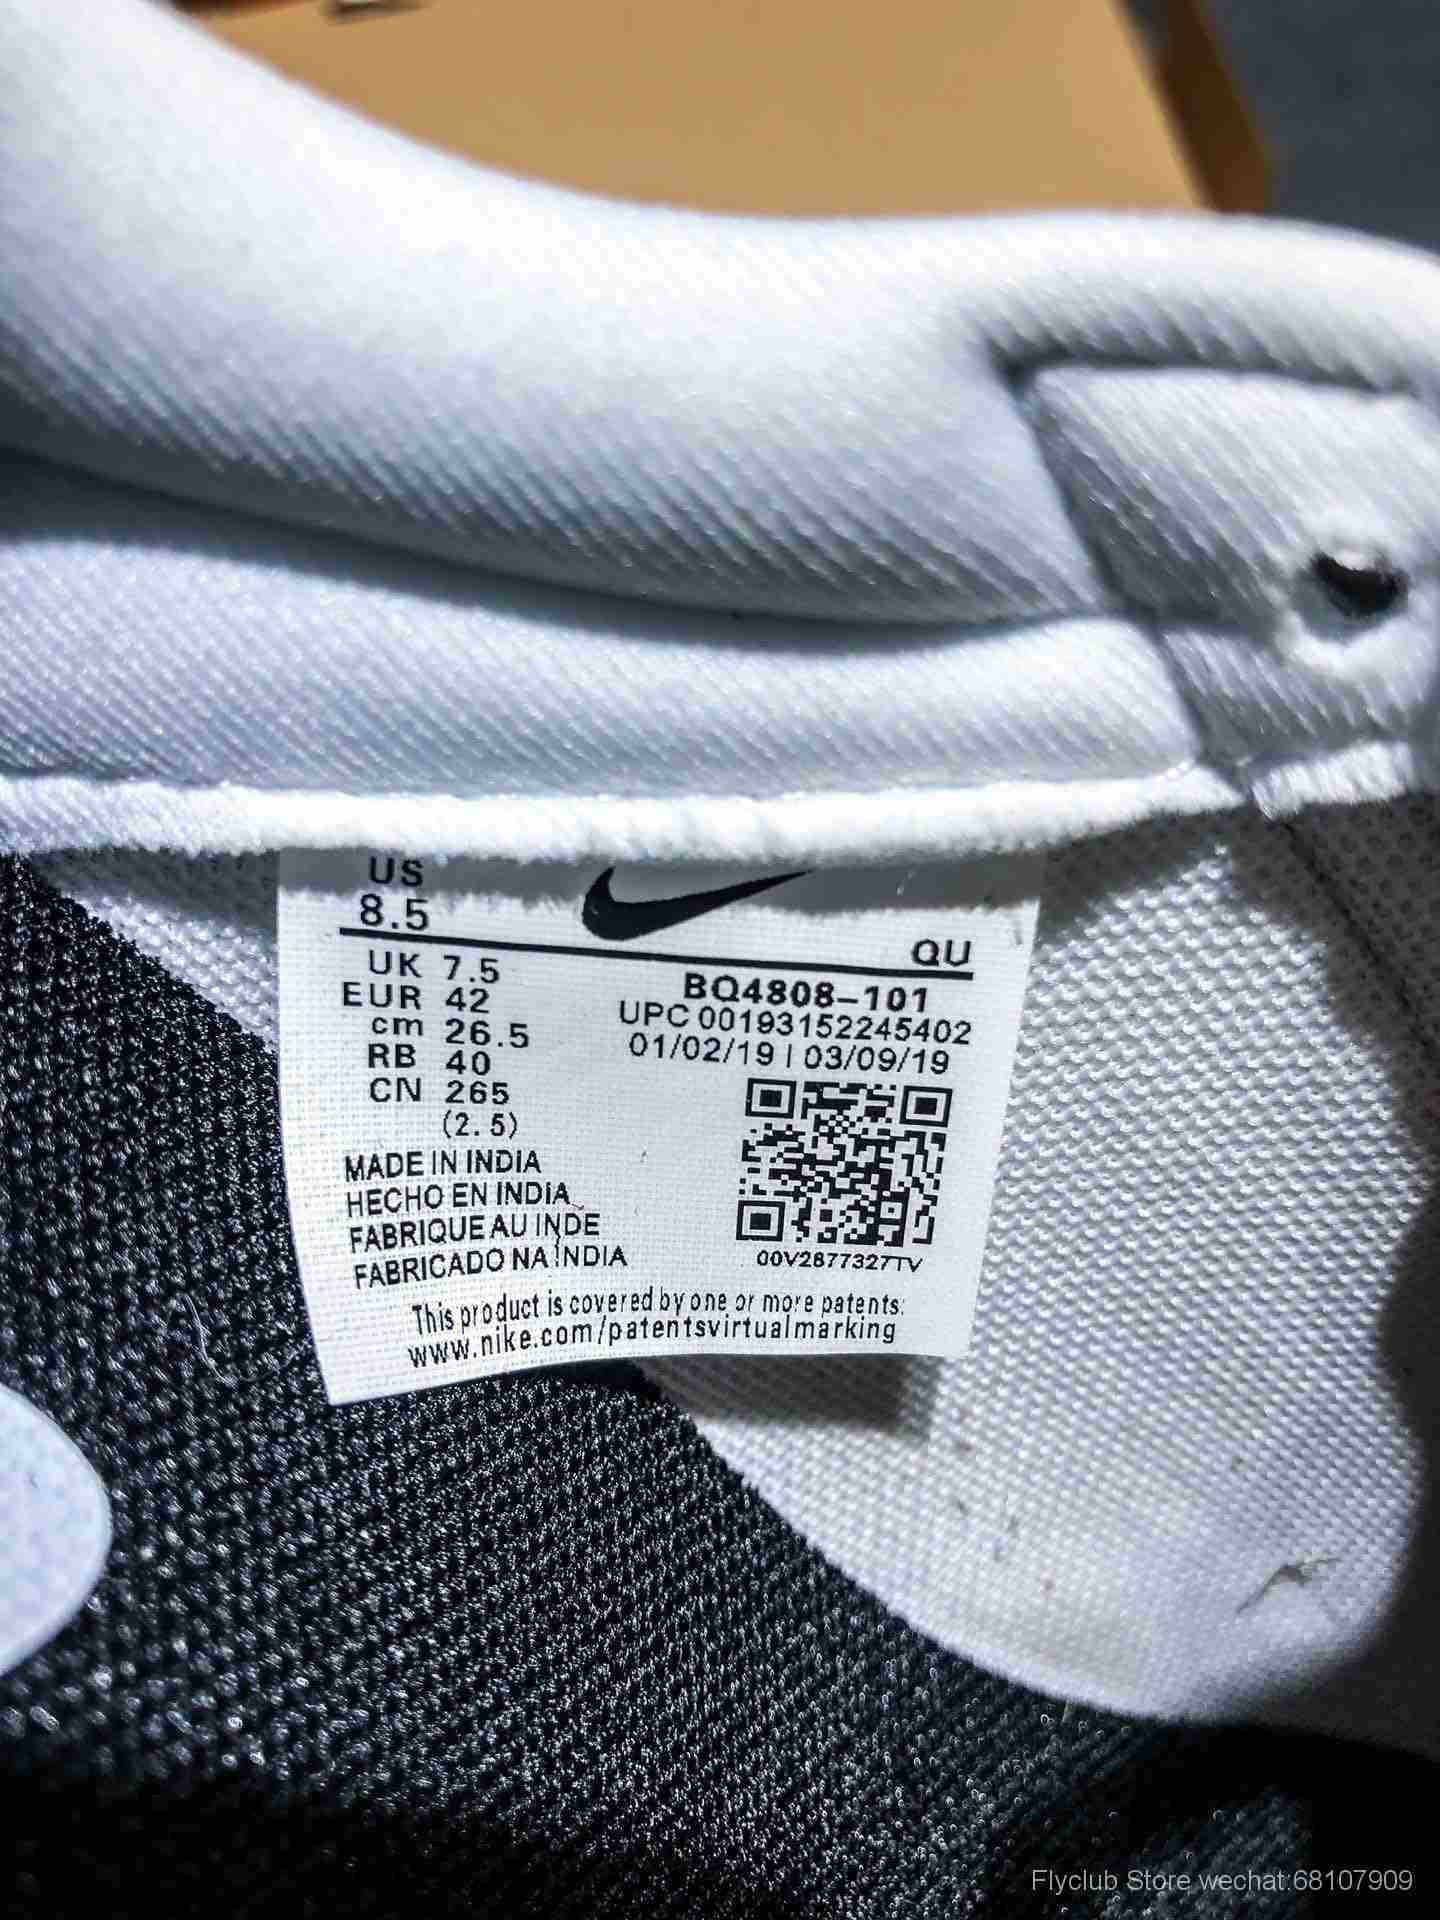 "Blazer Low 开拓者""涂鸦勾""复古低帮休闲板鞋 BQ4808-101"